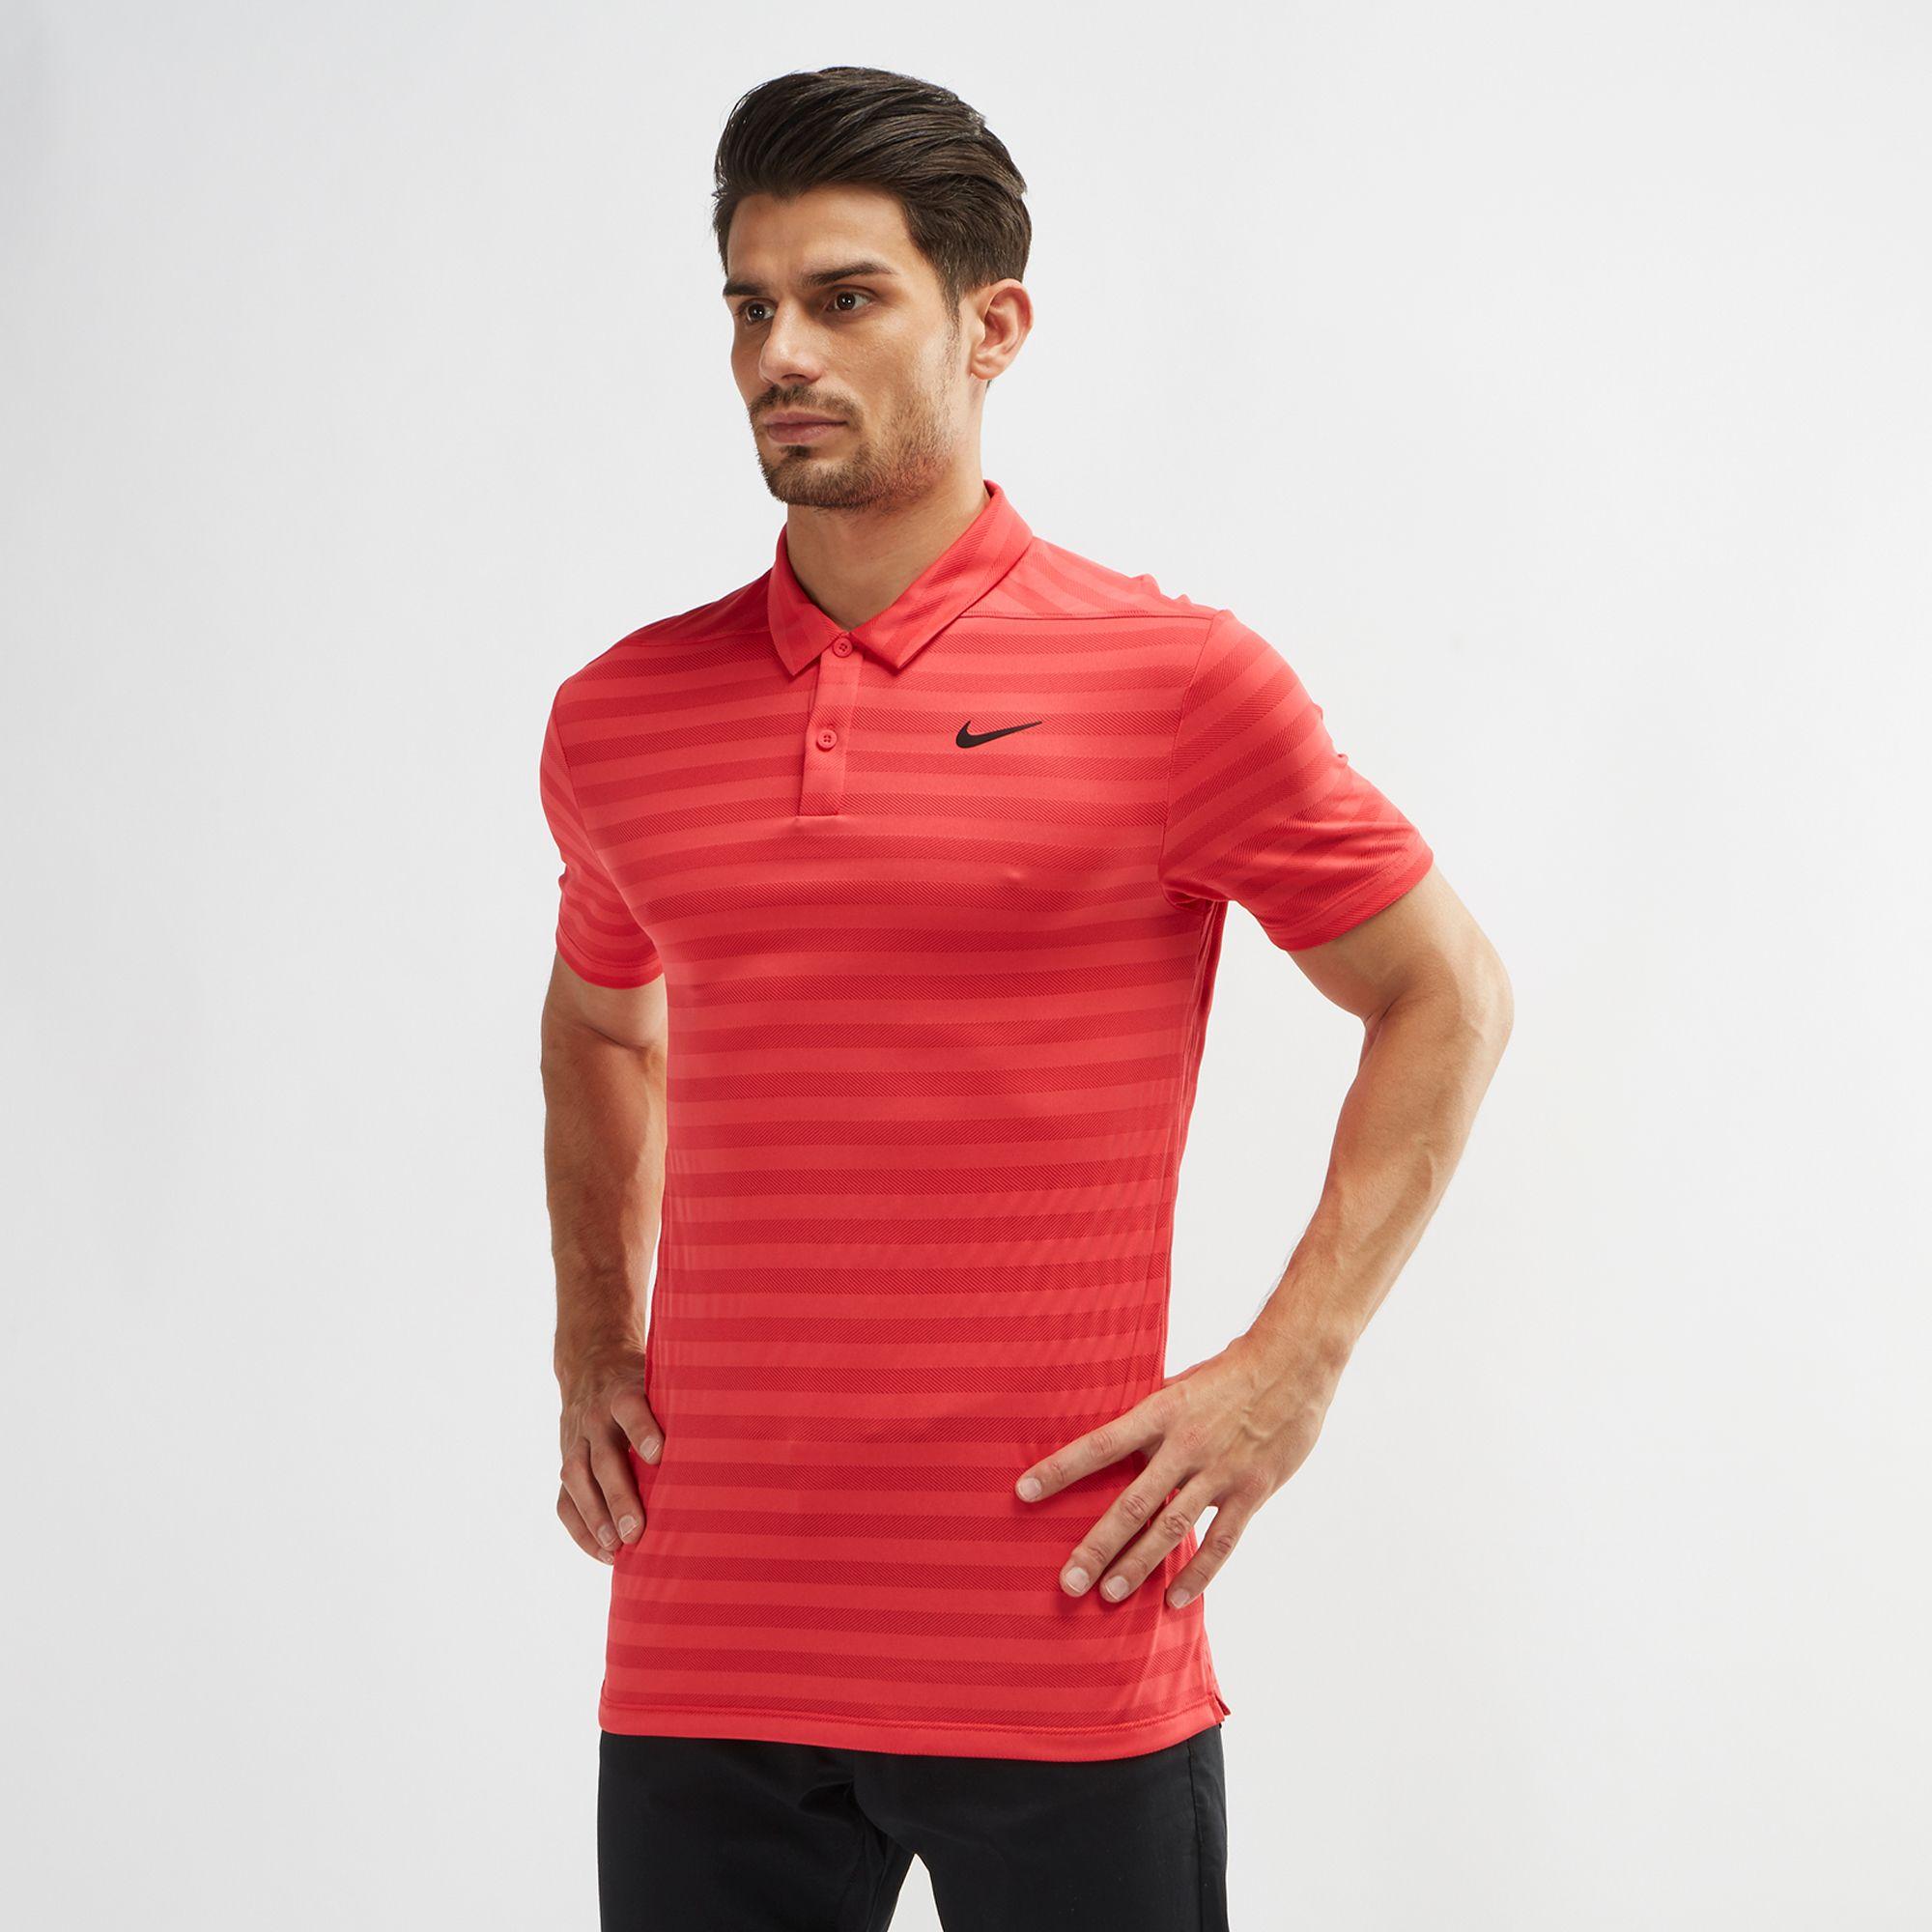 a5beec2f4 ... denmark mens pink nike polo shirt 60848 07471